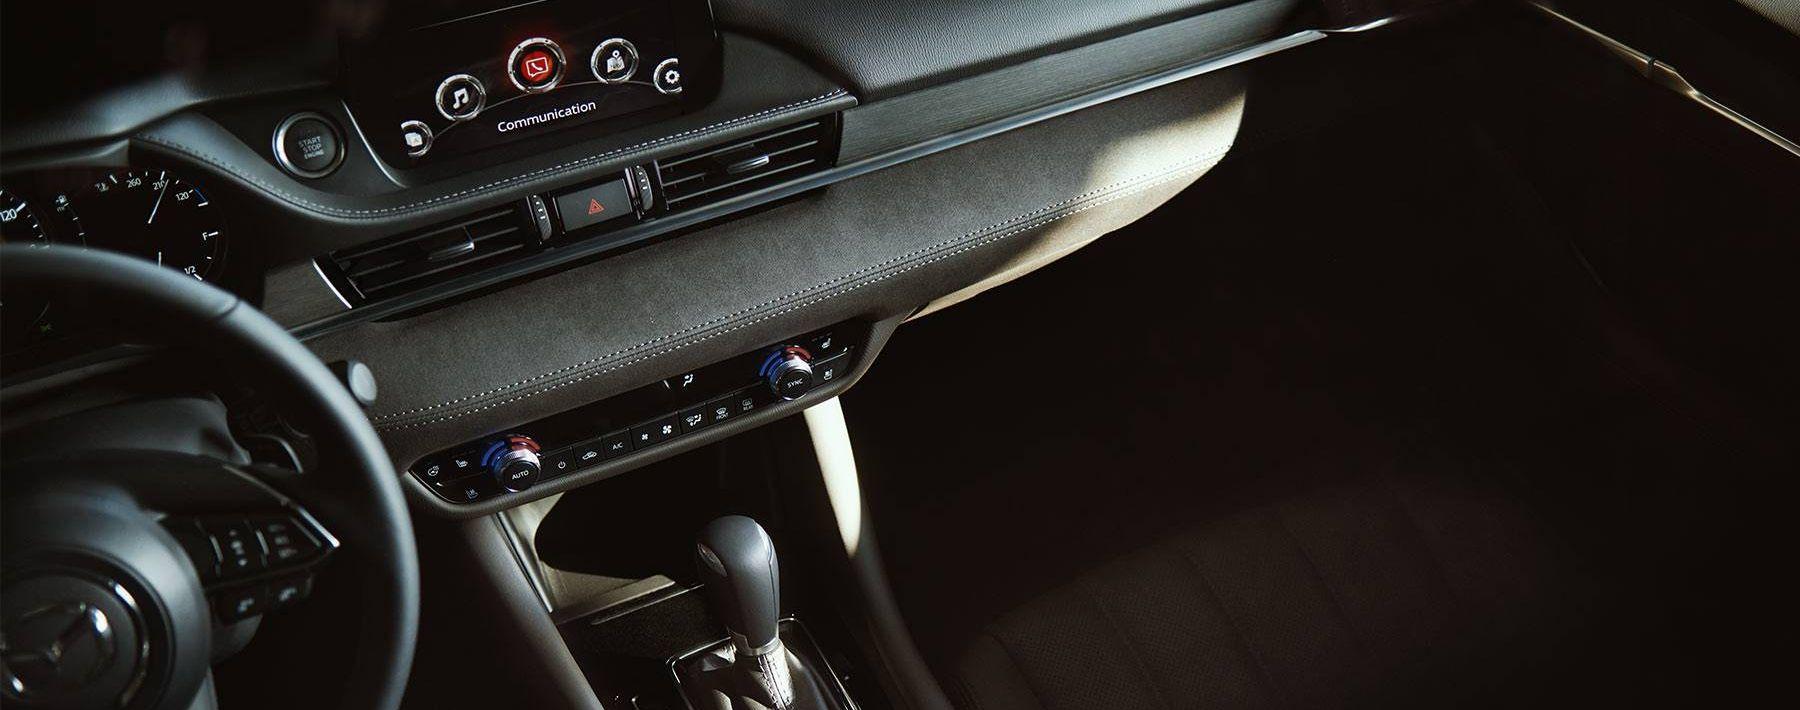 Stunning Interior of the Mazda6